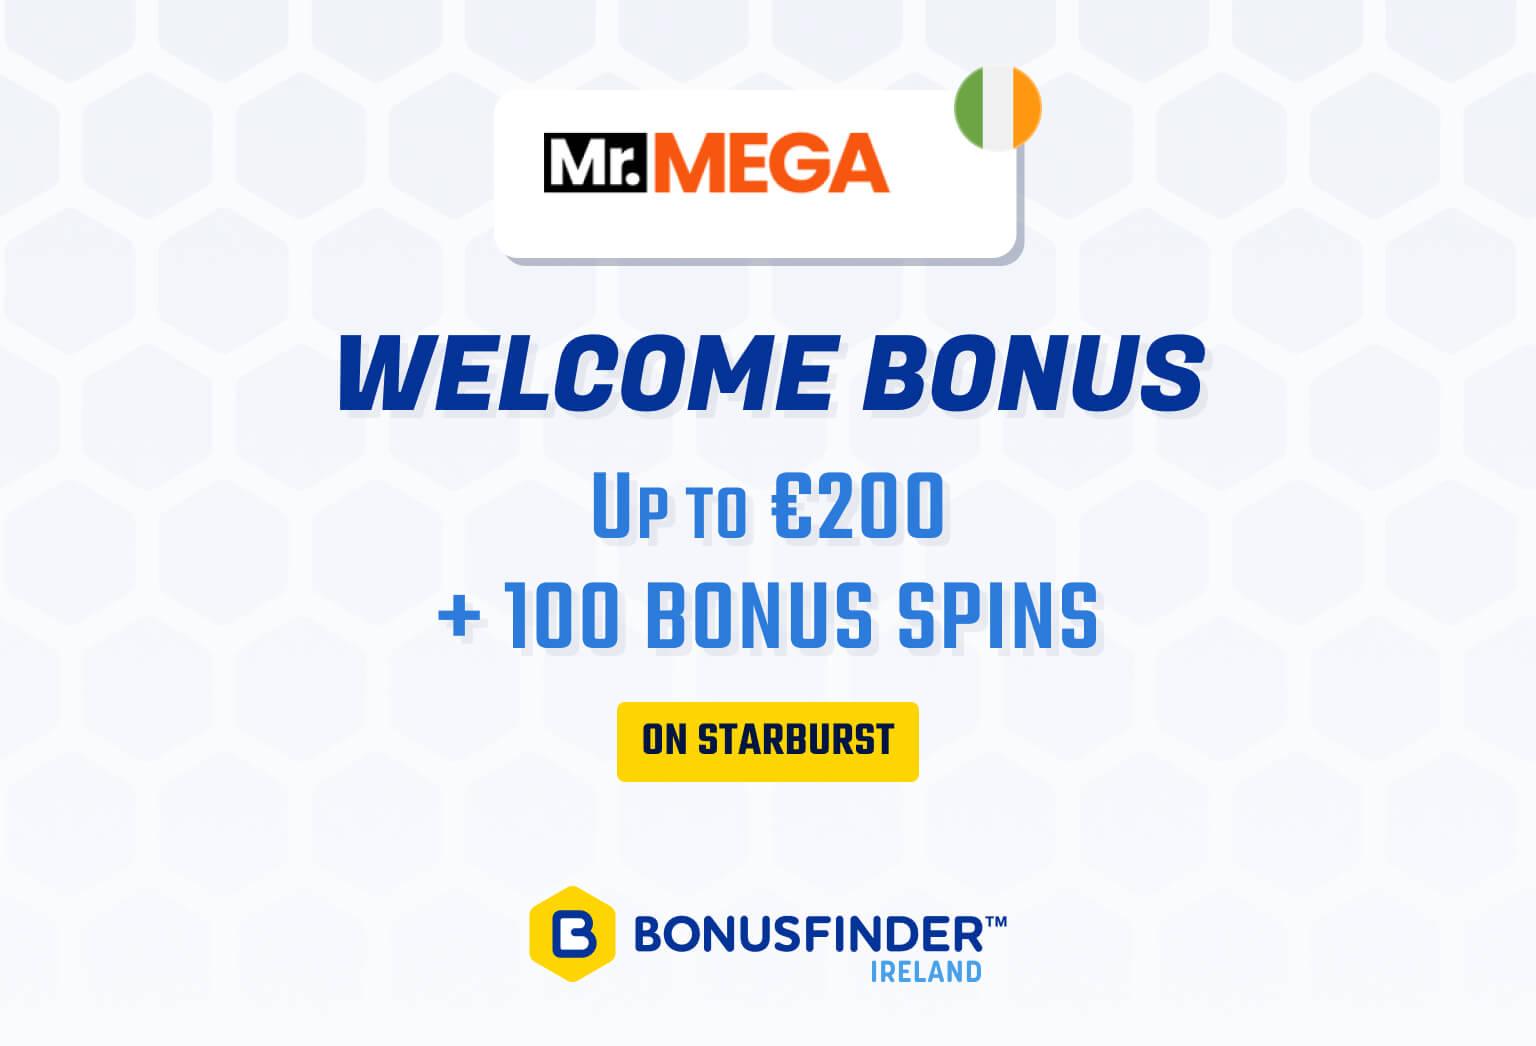 mrmega welcome bonus